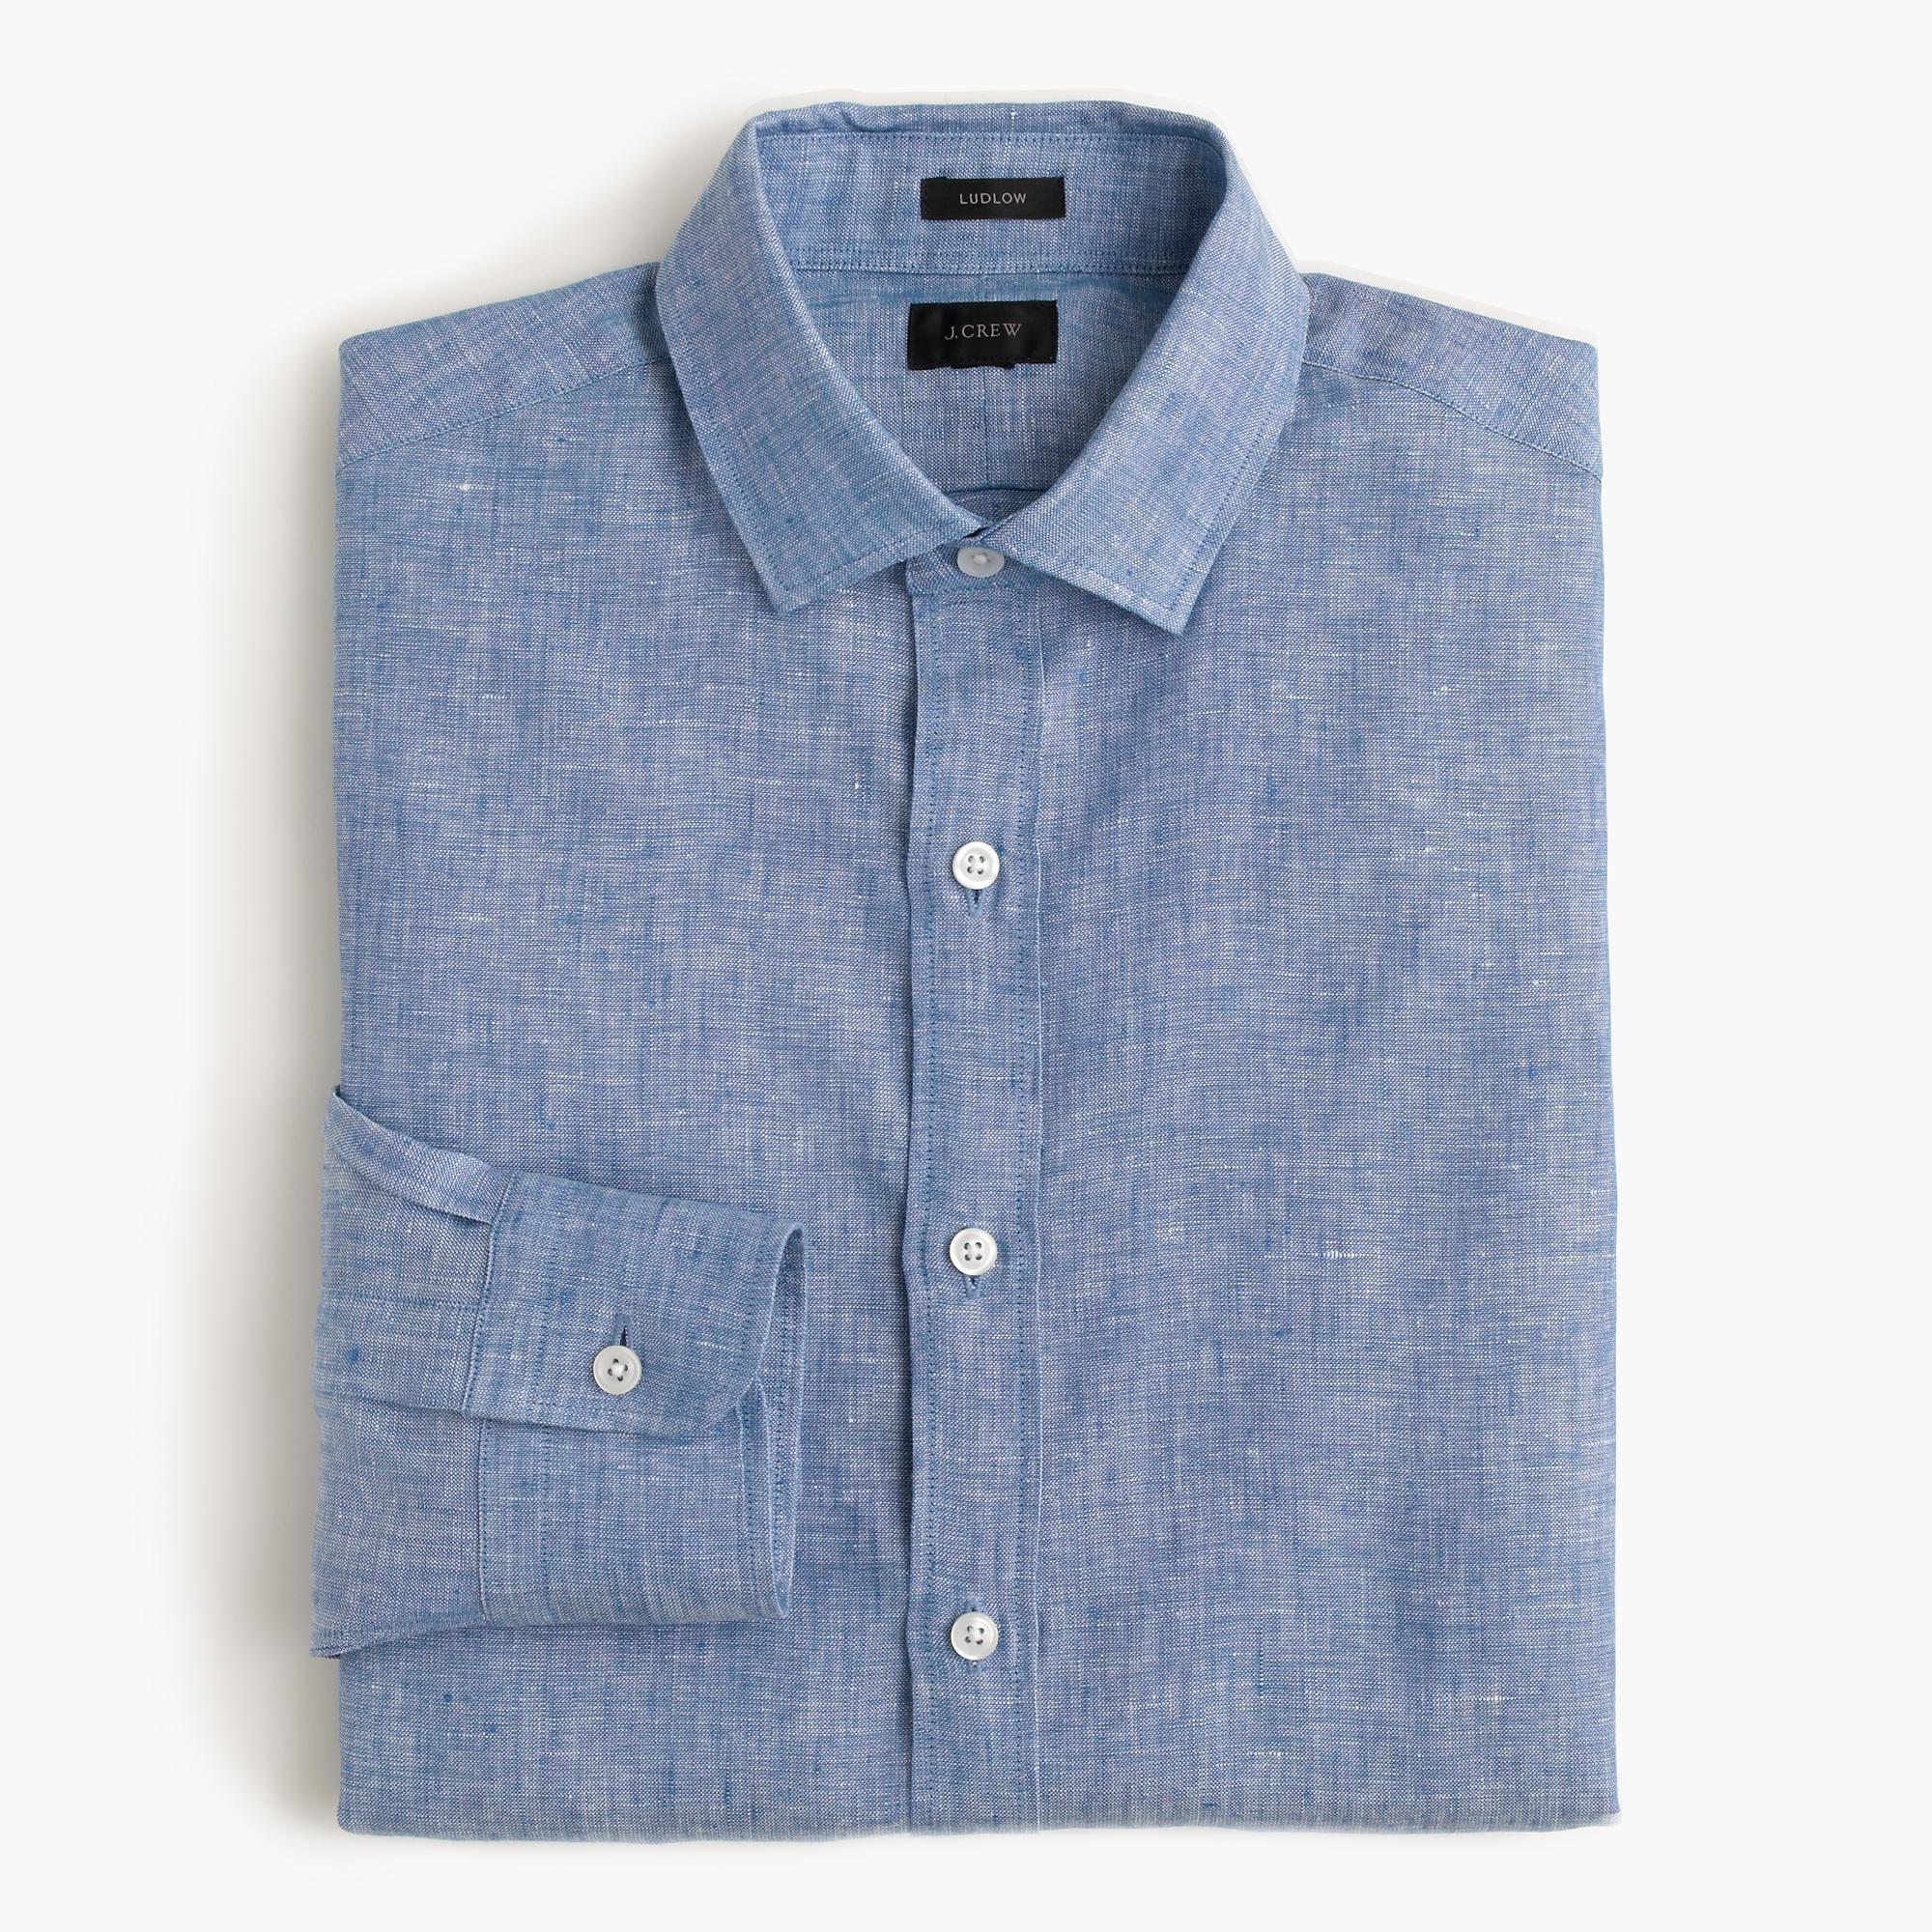 Ludlow shirt in d lav irish linen in blue for men for Irish linen dress shirts